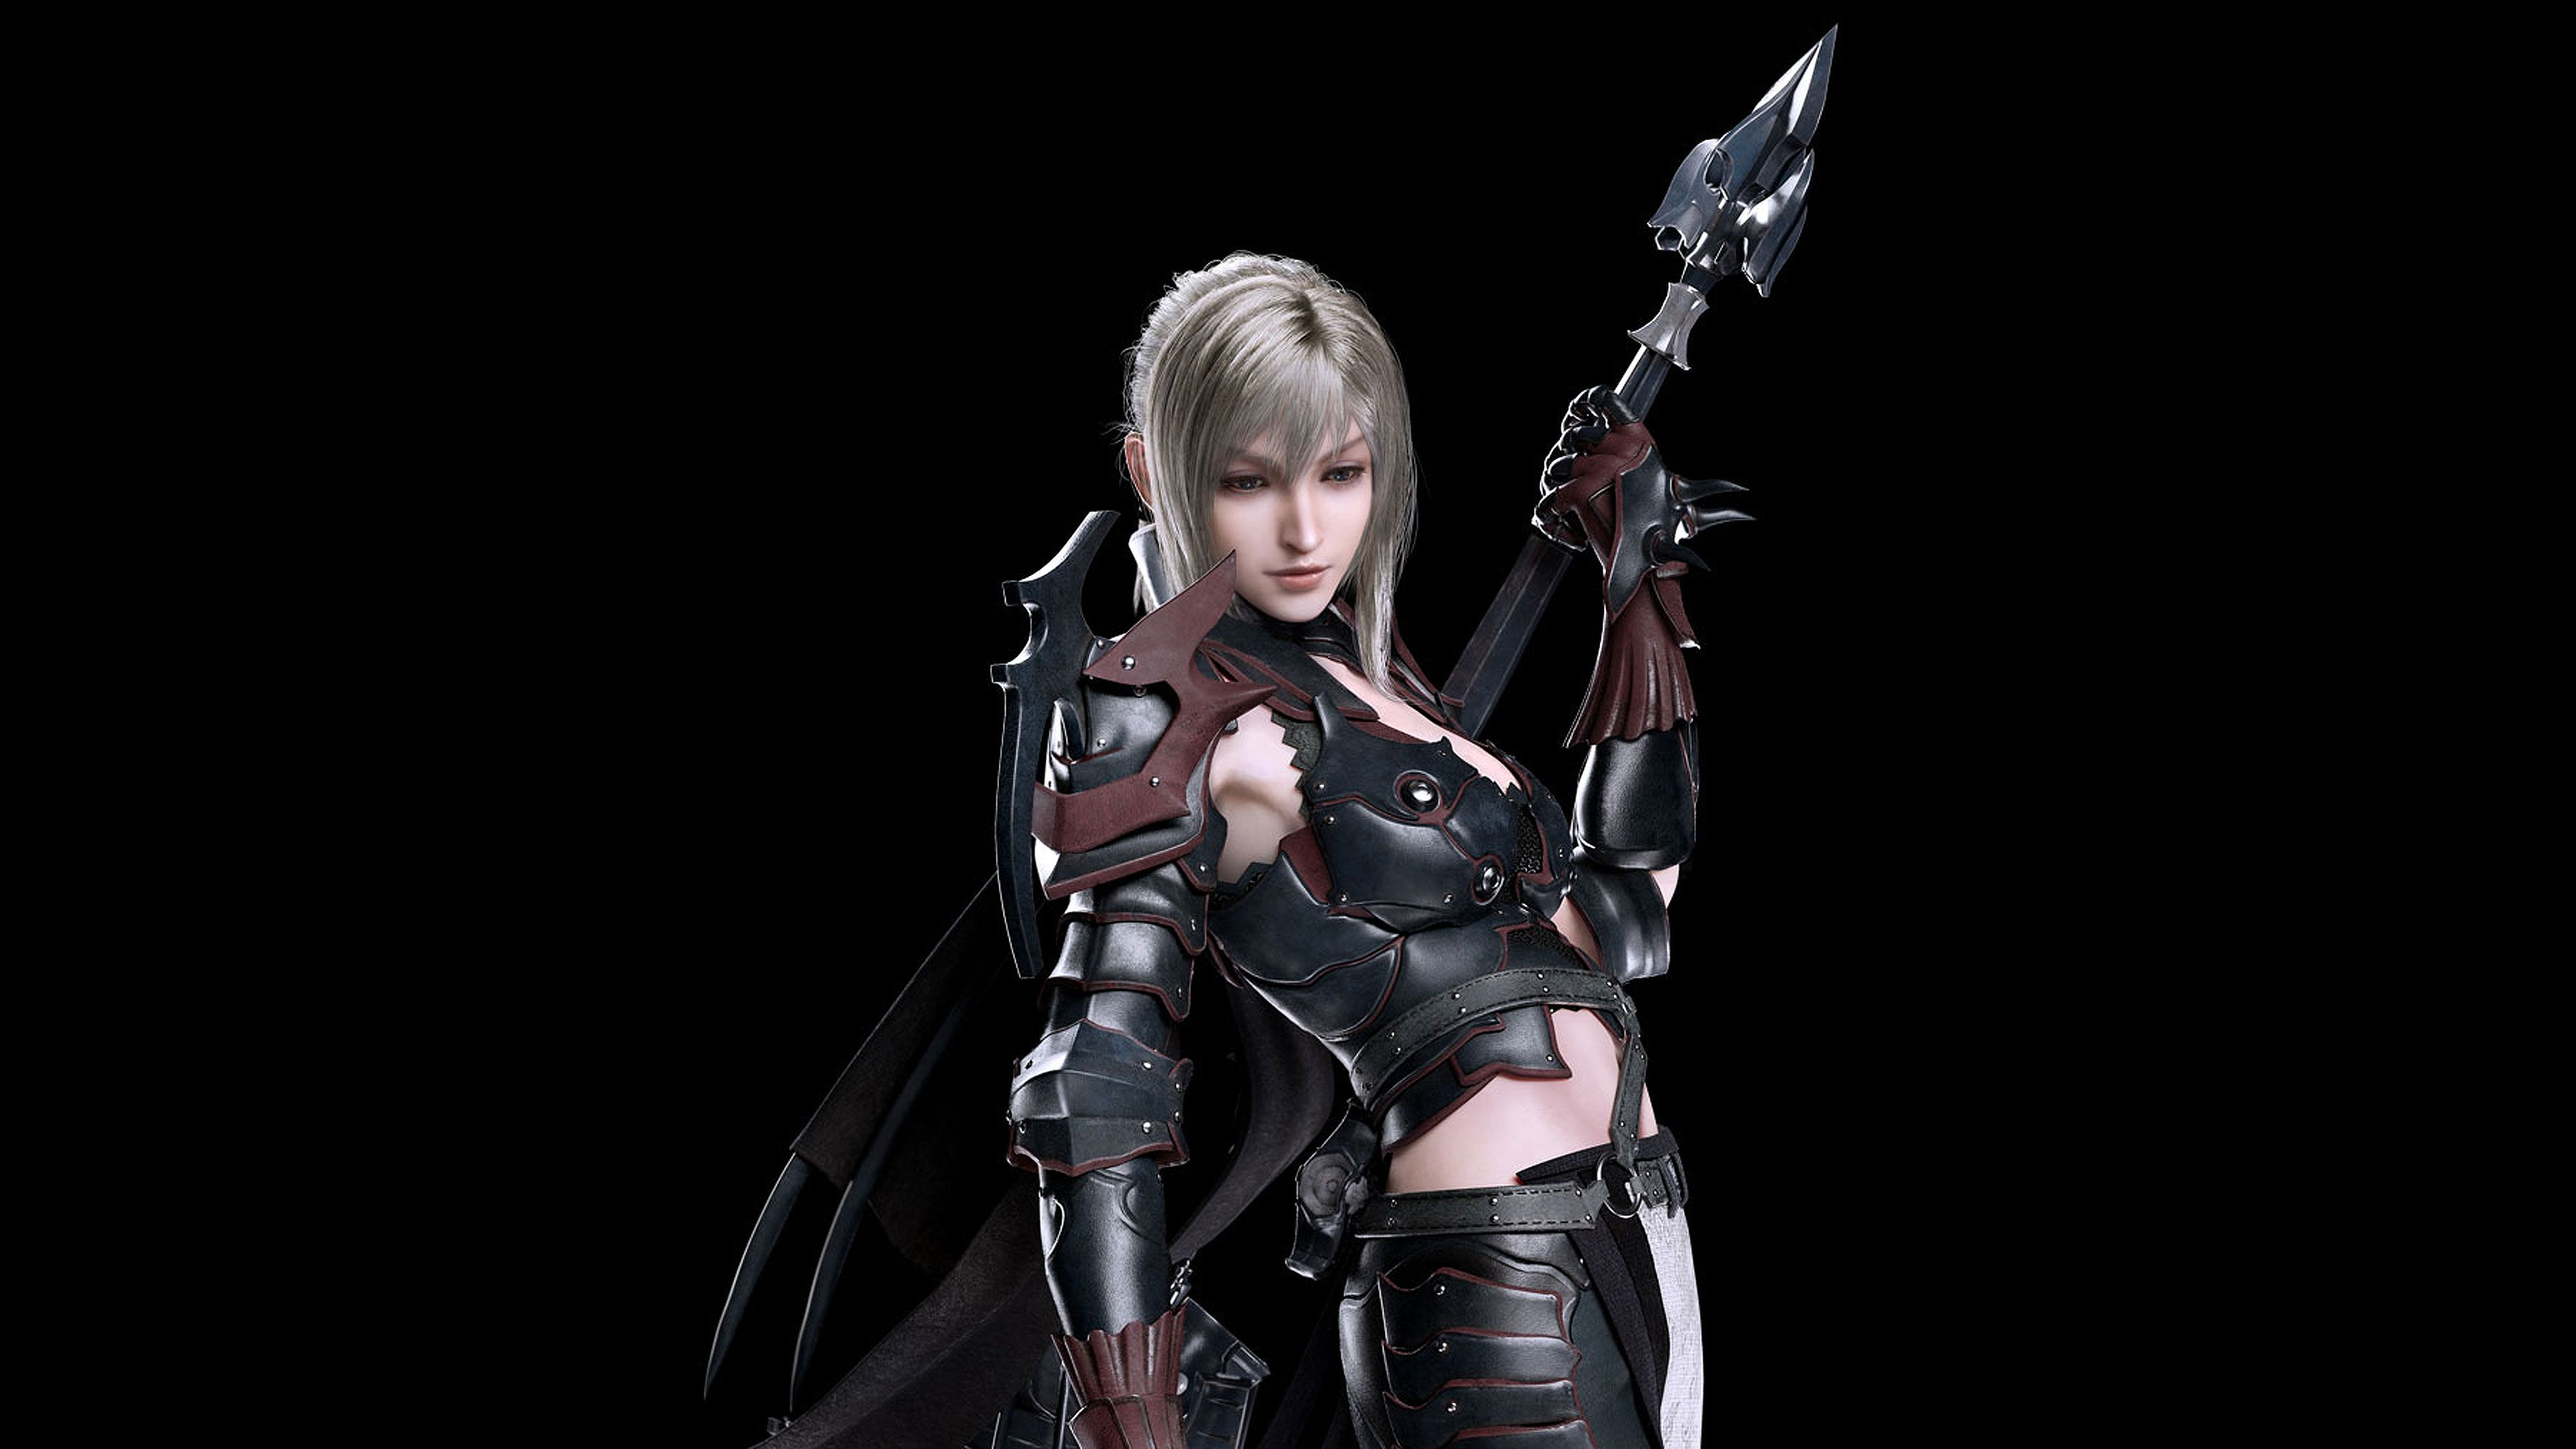 Aranea Highwind Final Fantasy Xv 3840x2160 Wallpaper Final Fantasy Xv Final Fantasy Fantasy